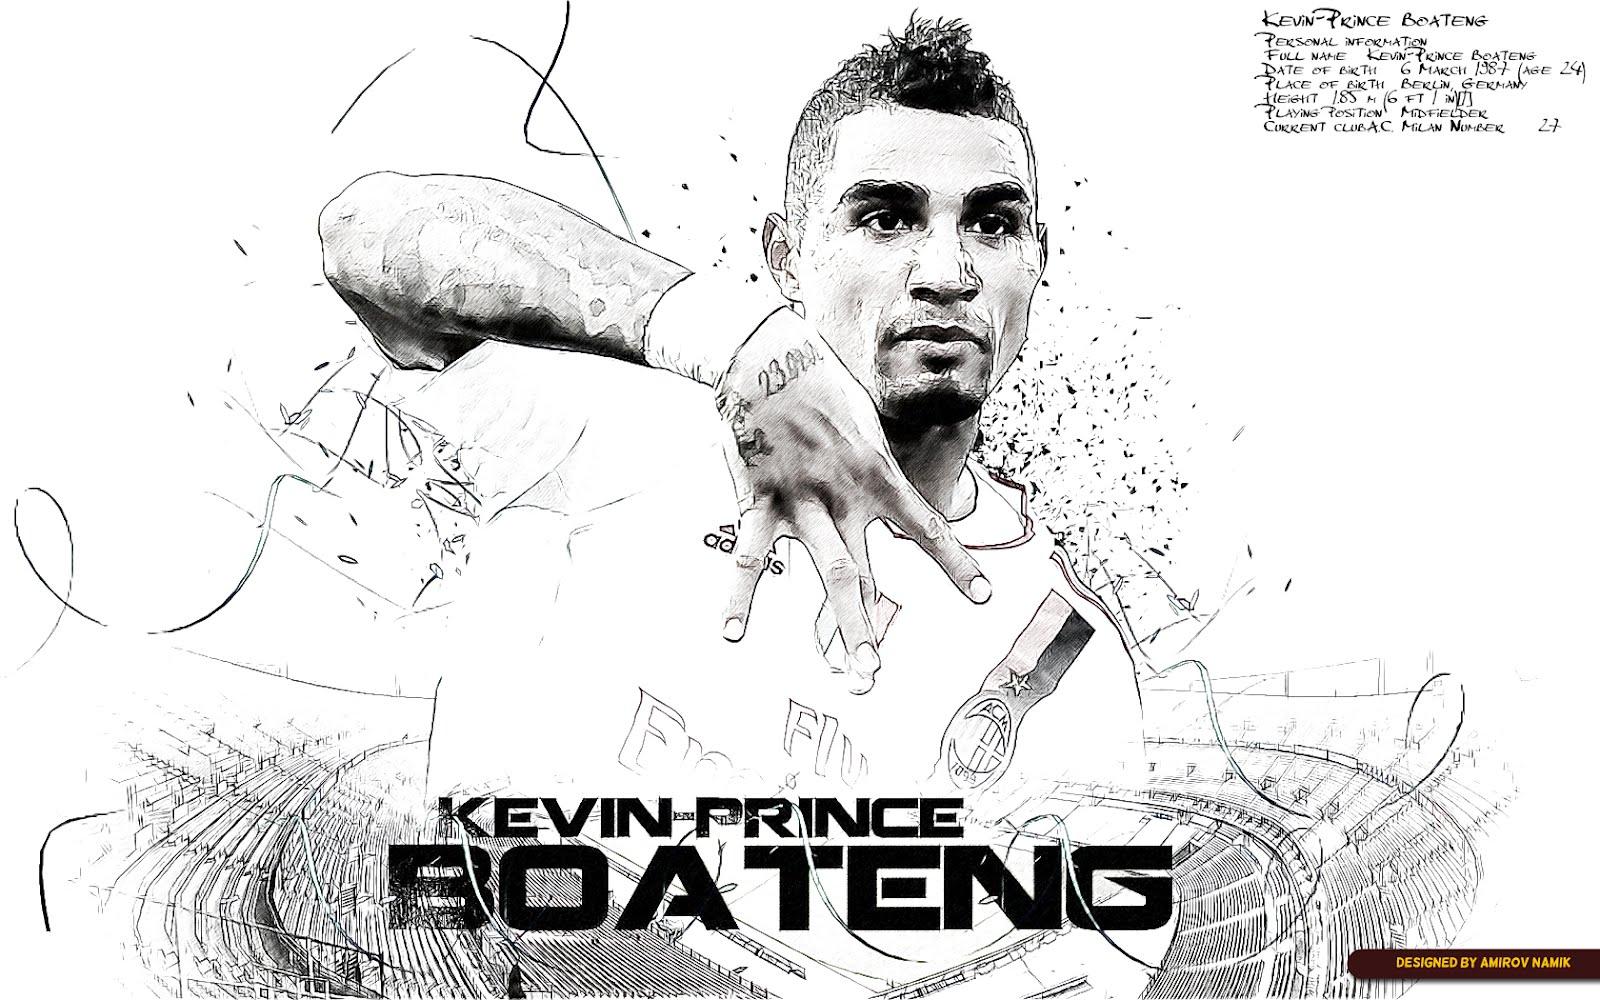 Cartoon Prince Boateng